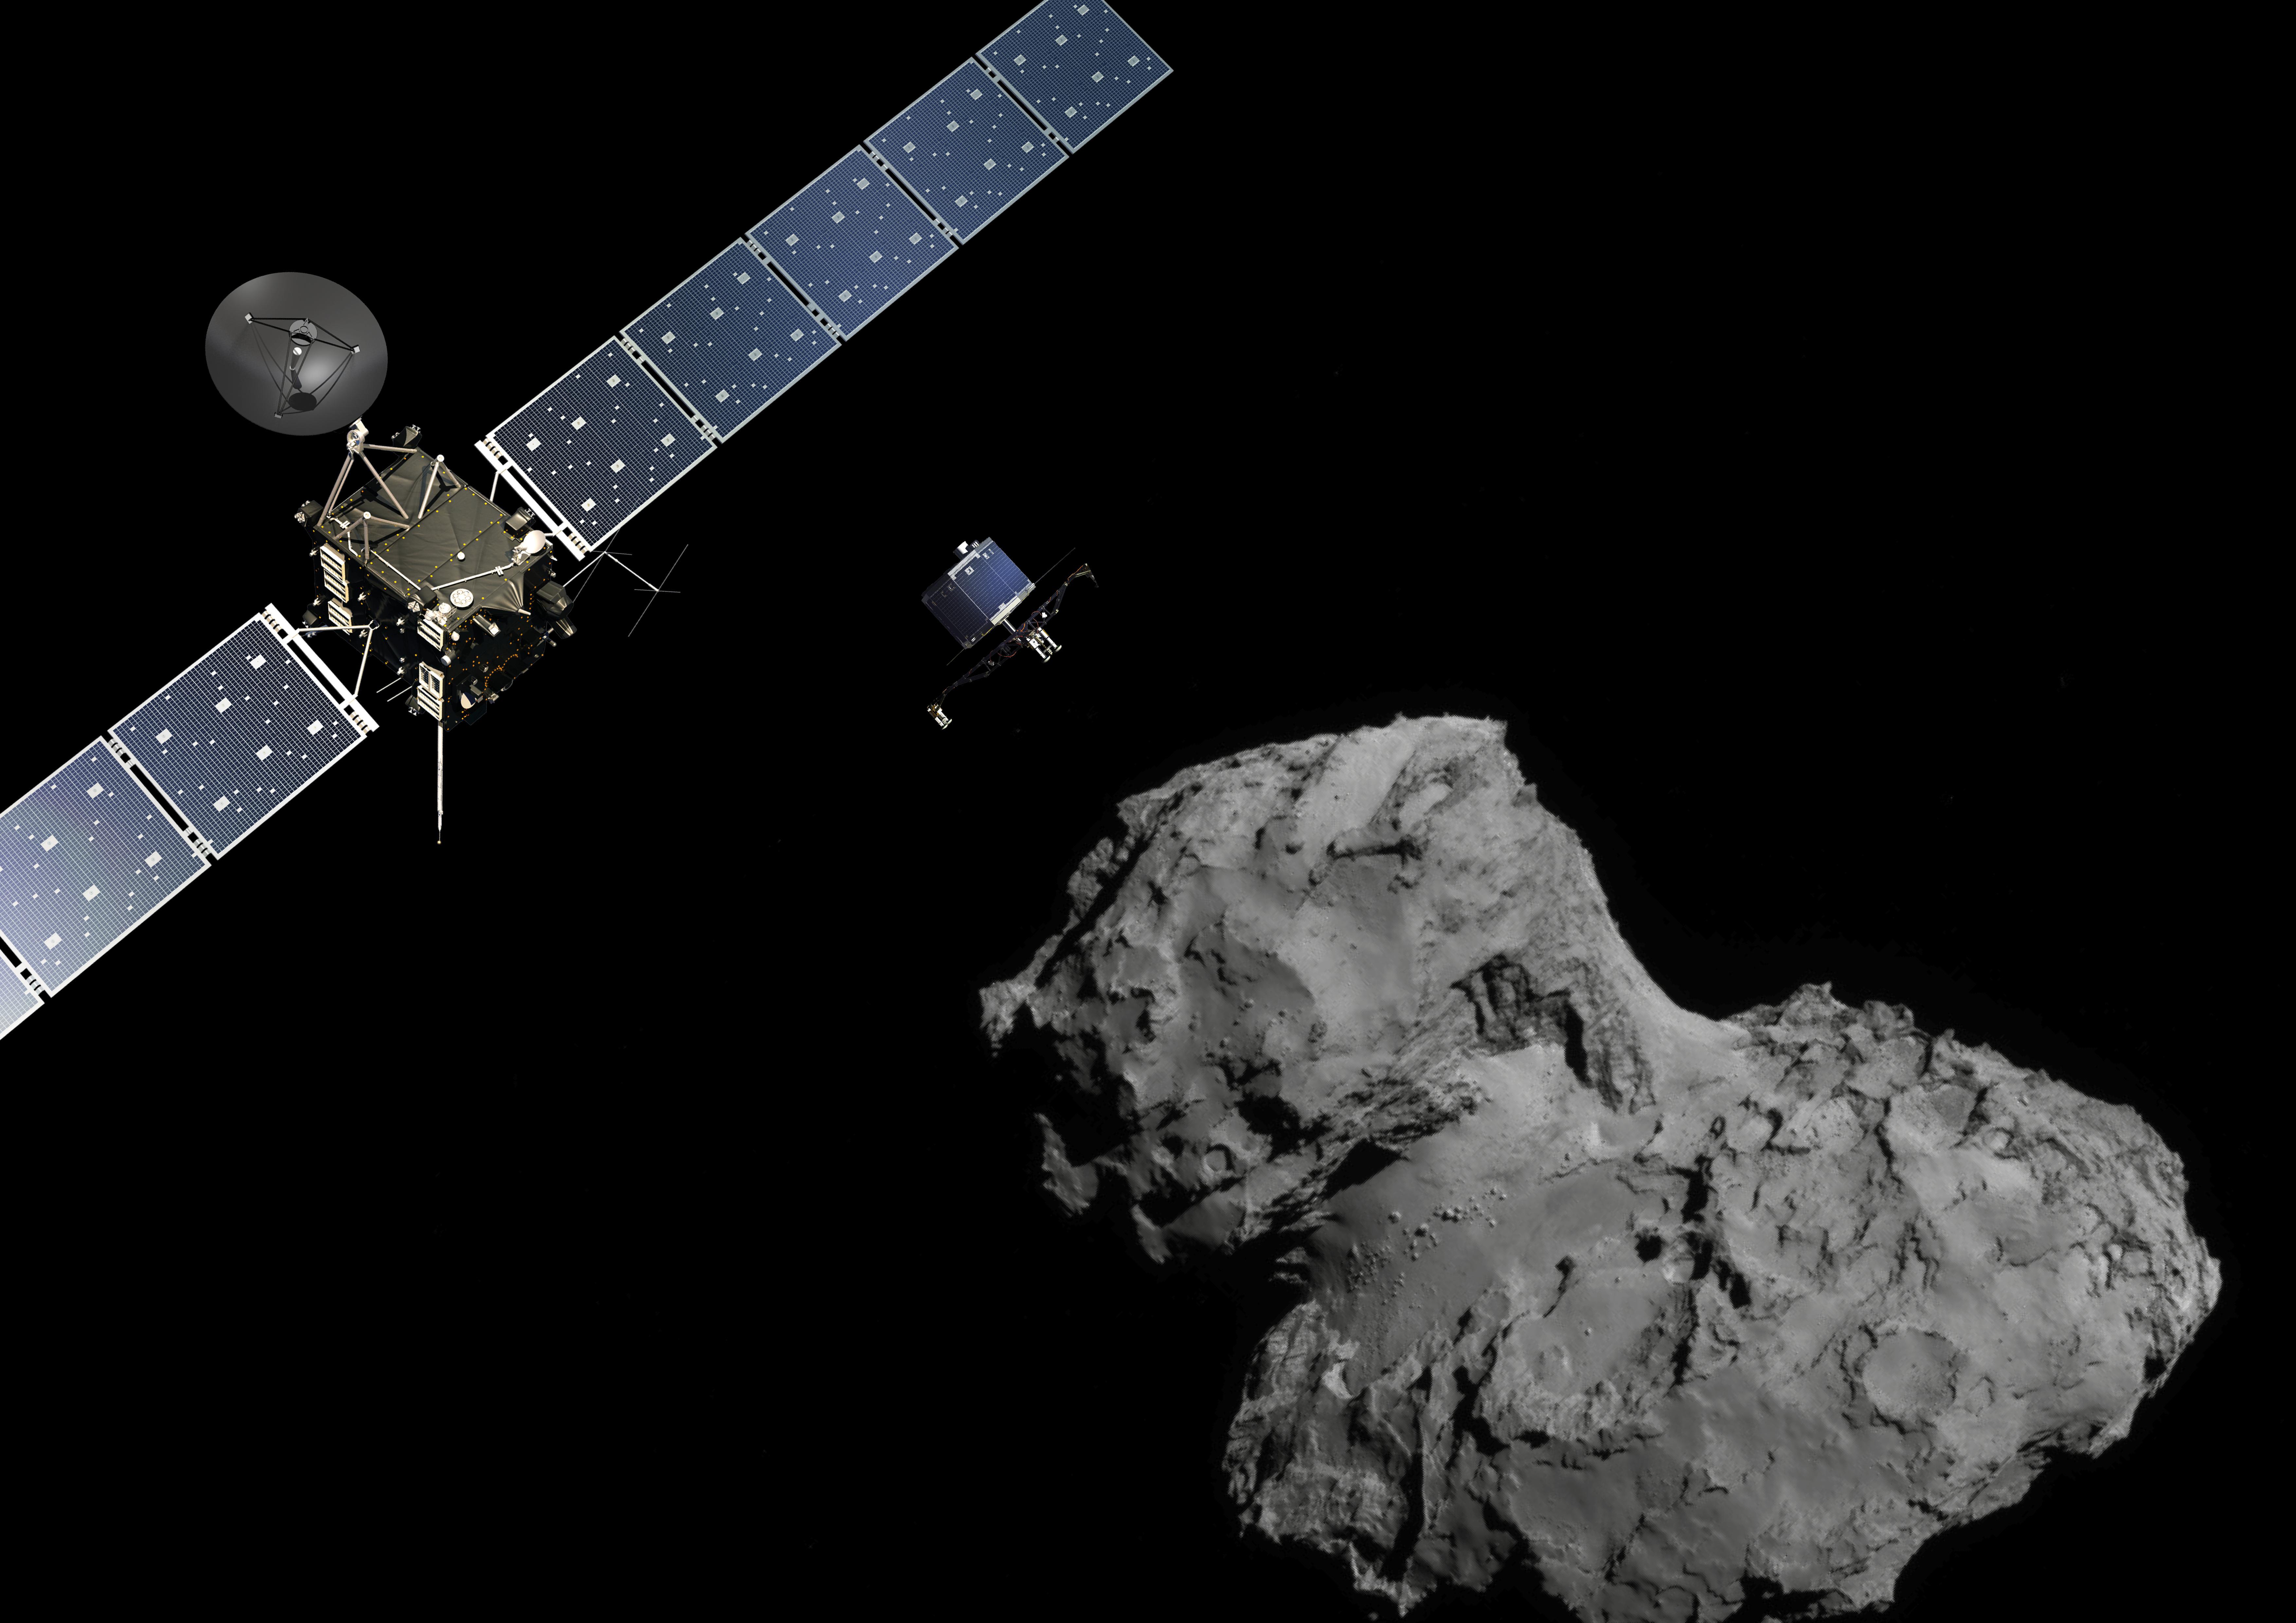 http://sci.esa.int/science-e-media/img/f7/Rosetta_at_comet_67P_landscape.jpg